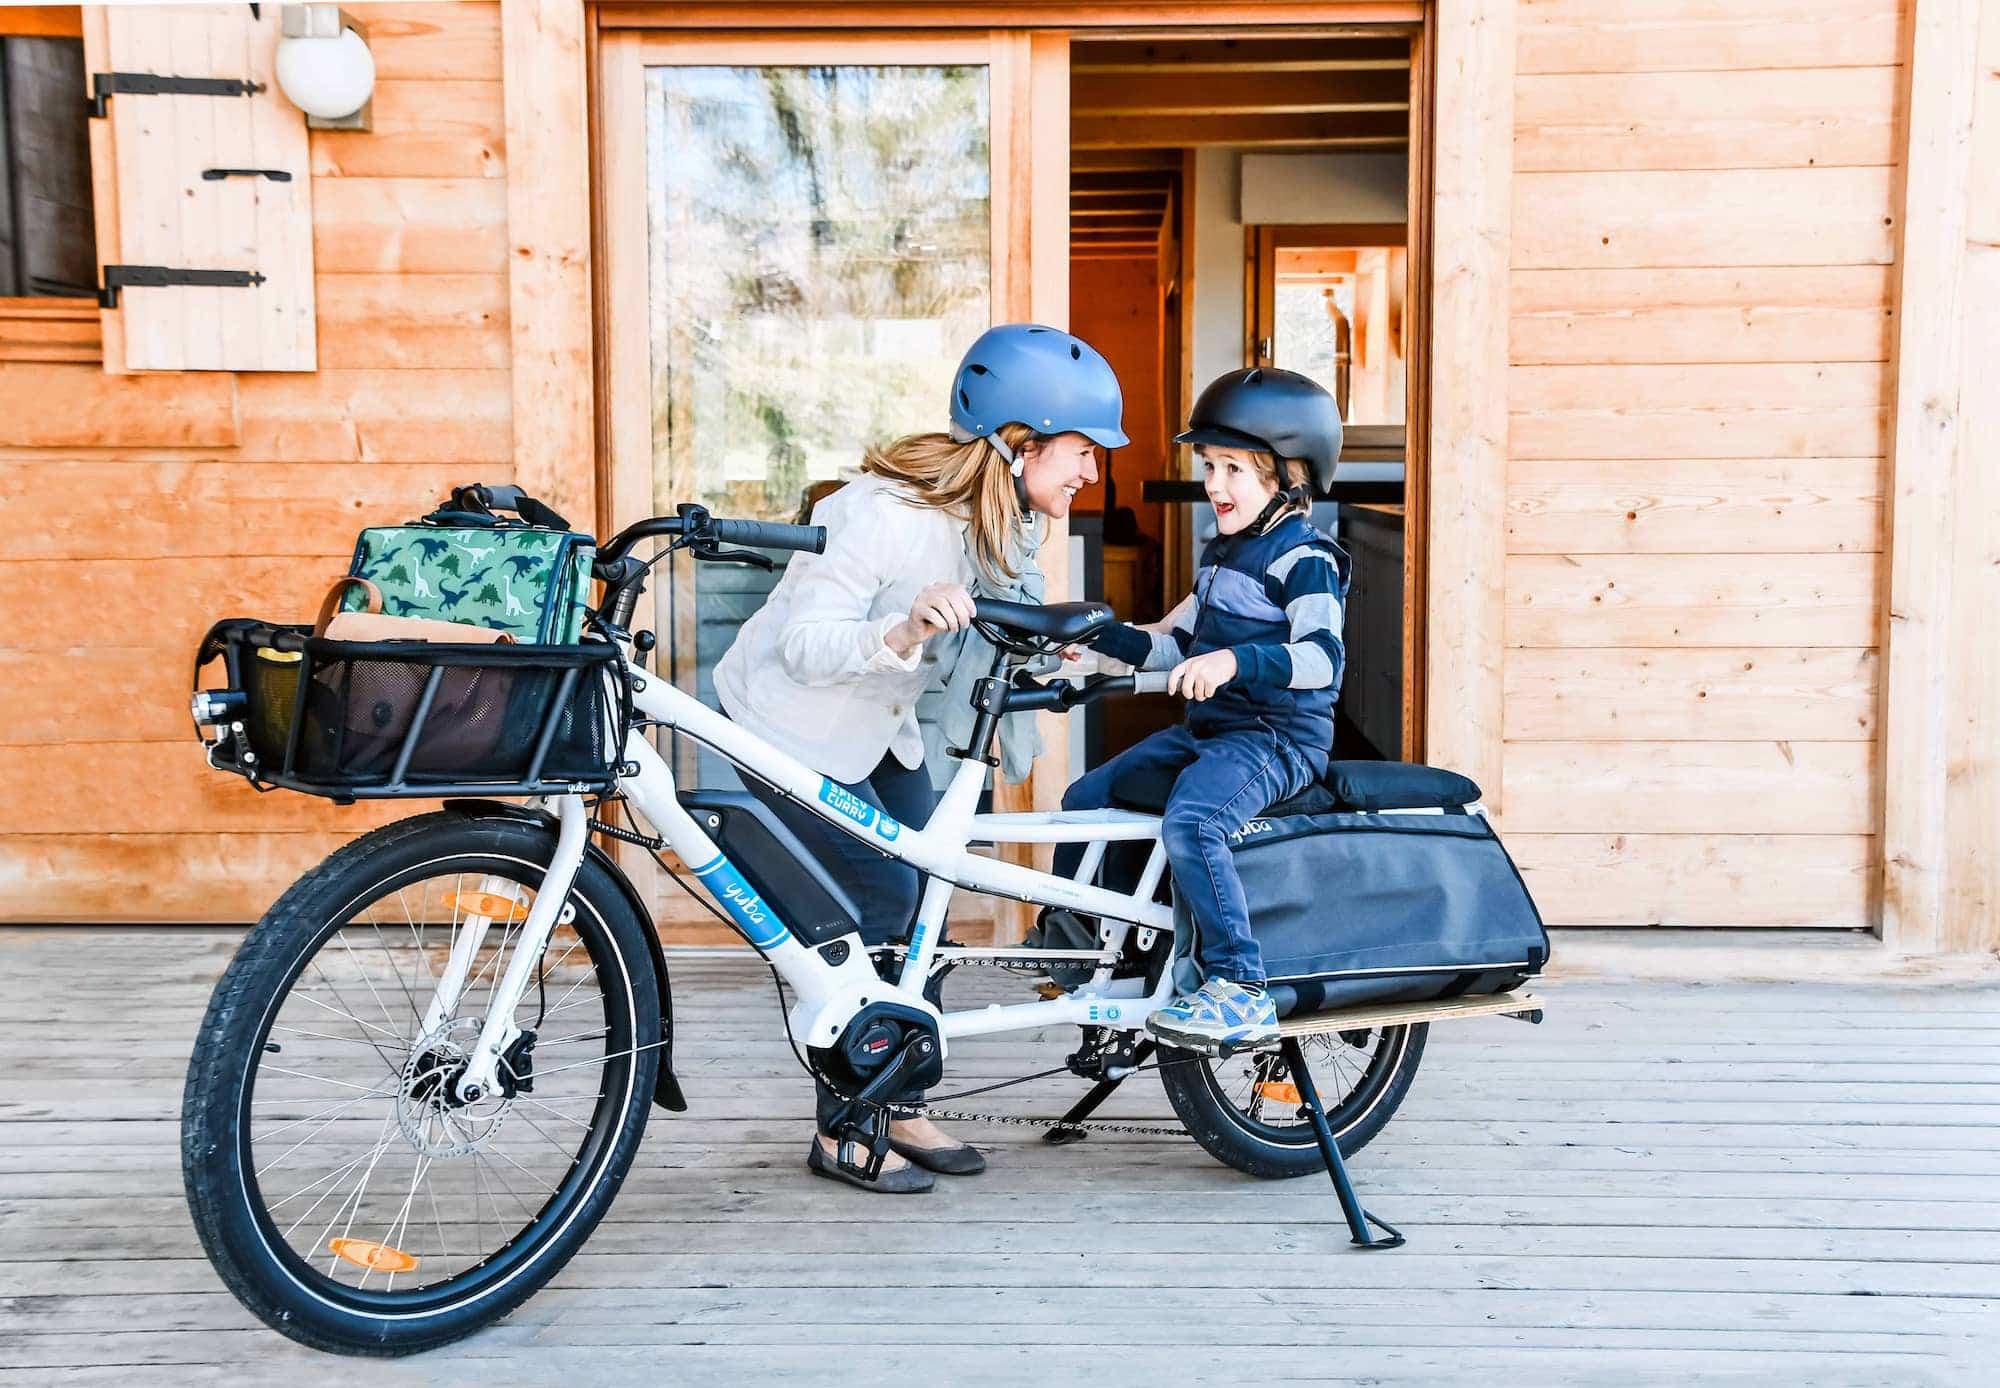 Yuba Spicy Curry Cargo Bike Lifestyle